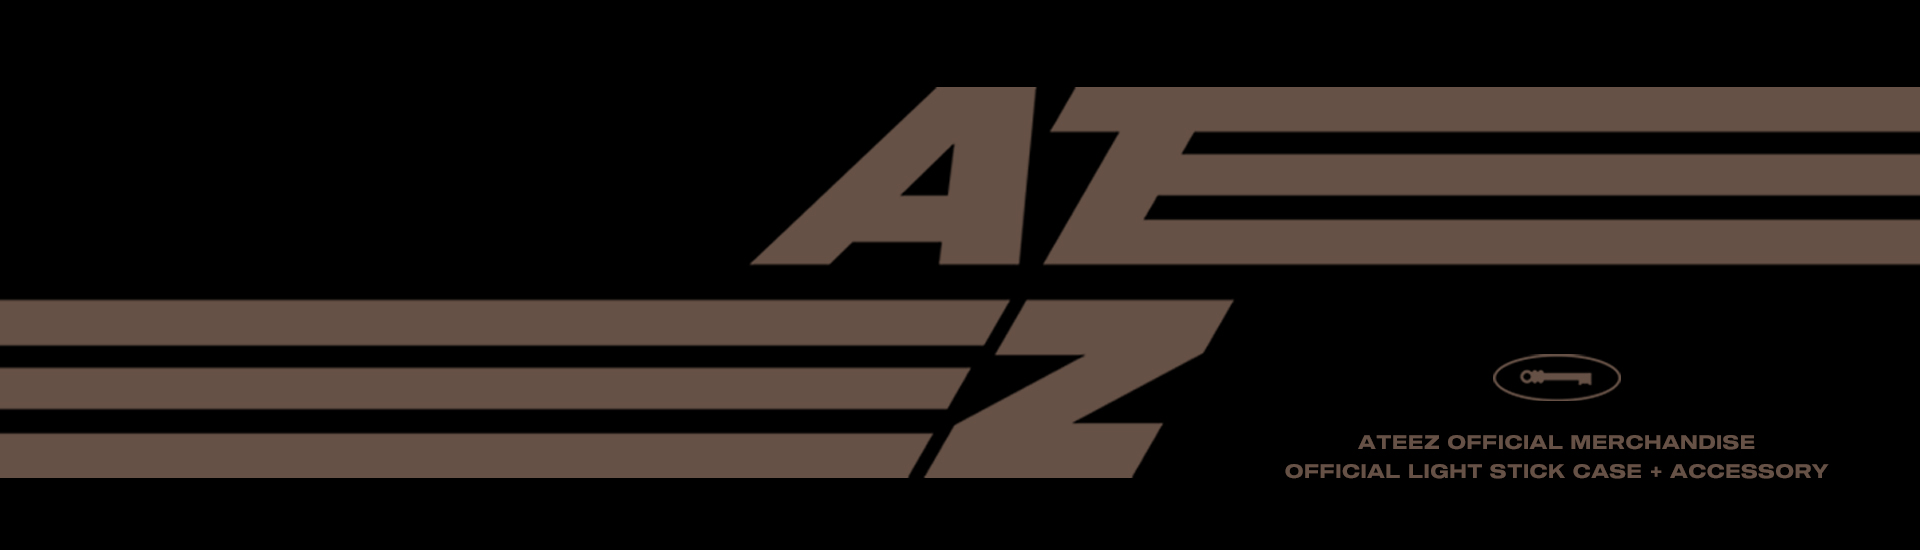 ATEEZ - OFFICIAL MERCHANDISE - OFFICIAL LIGHT STICK & CASE & ACCESSORIES